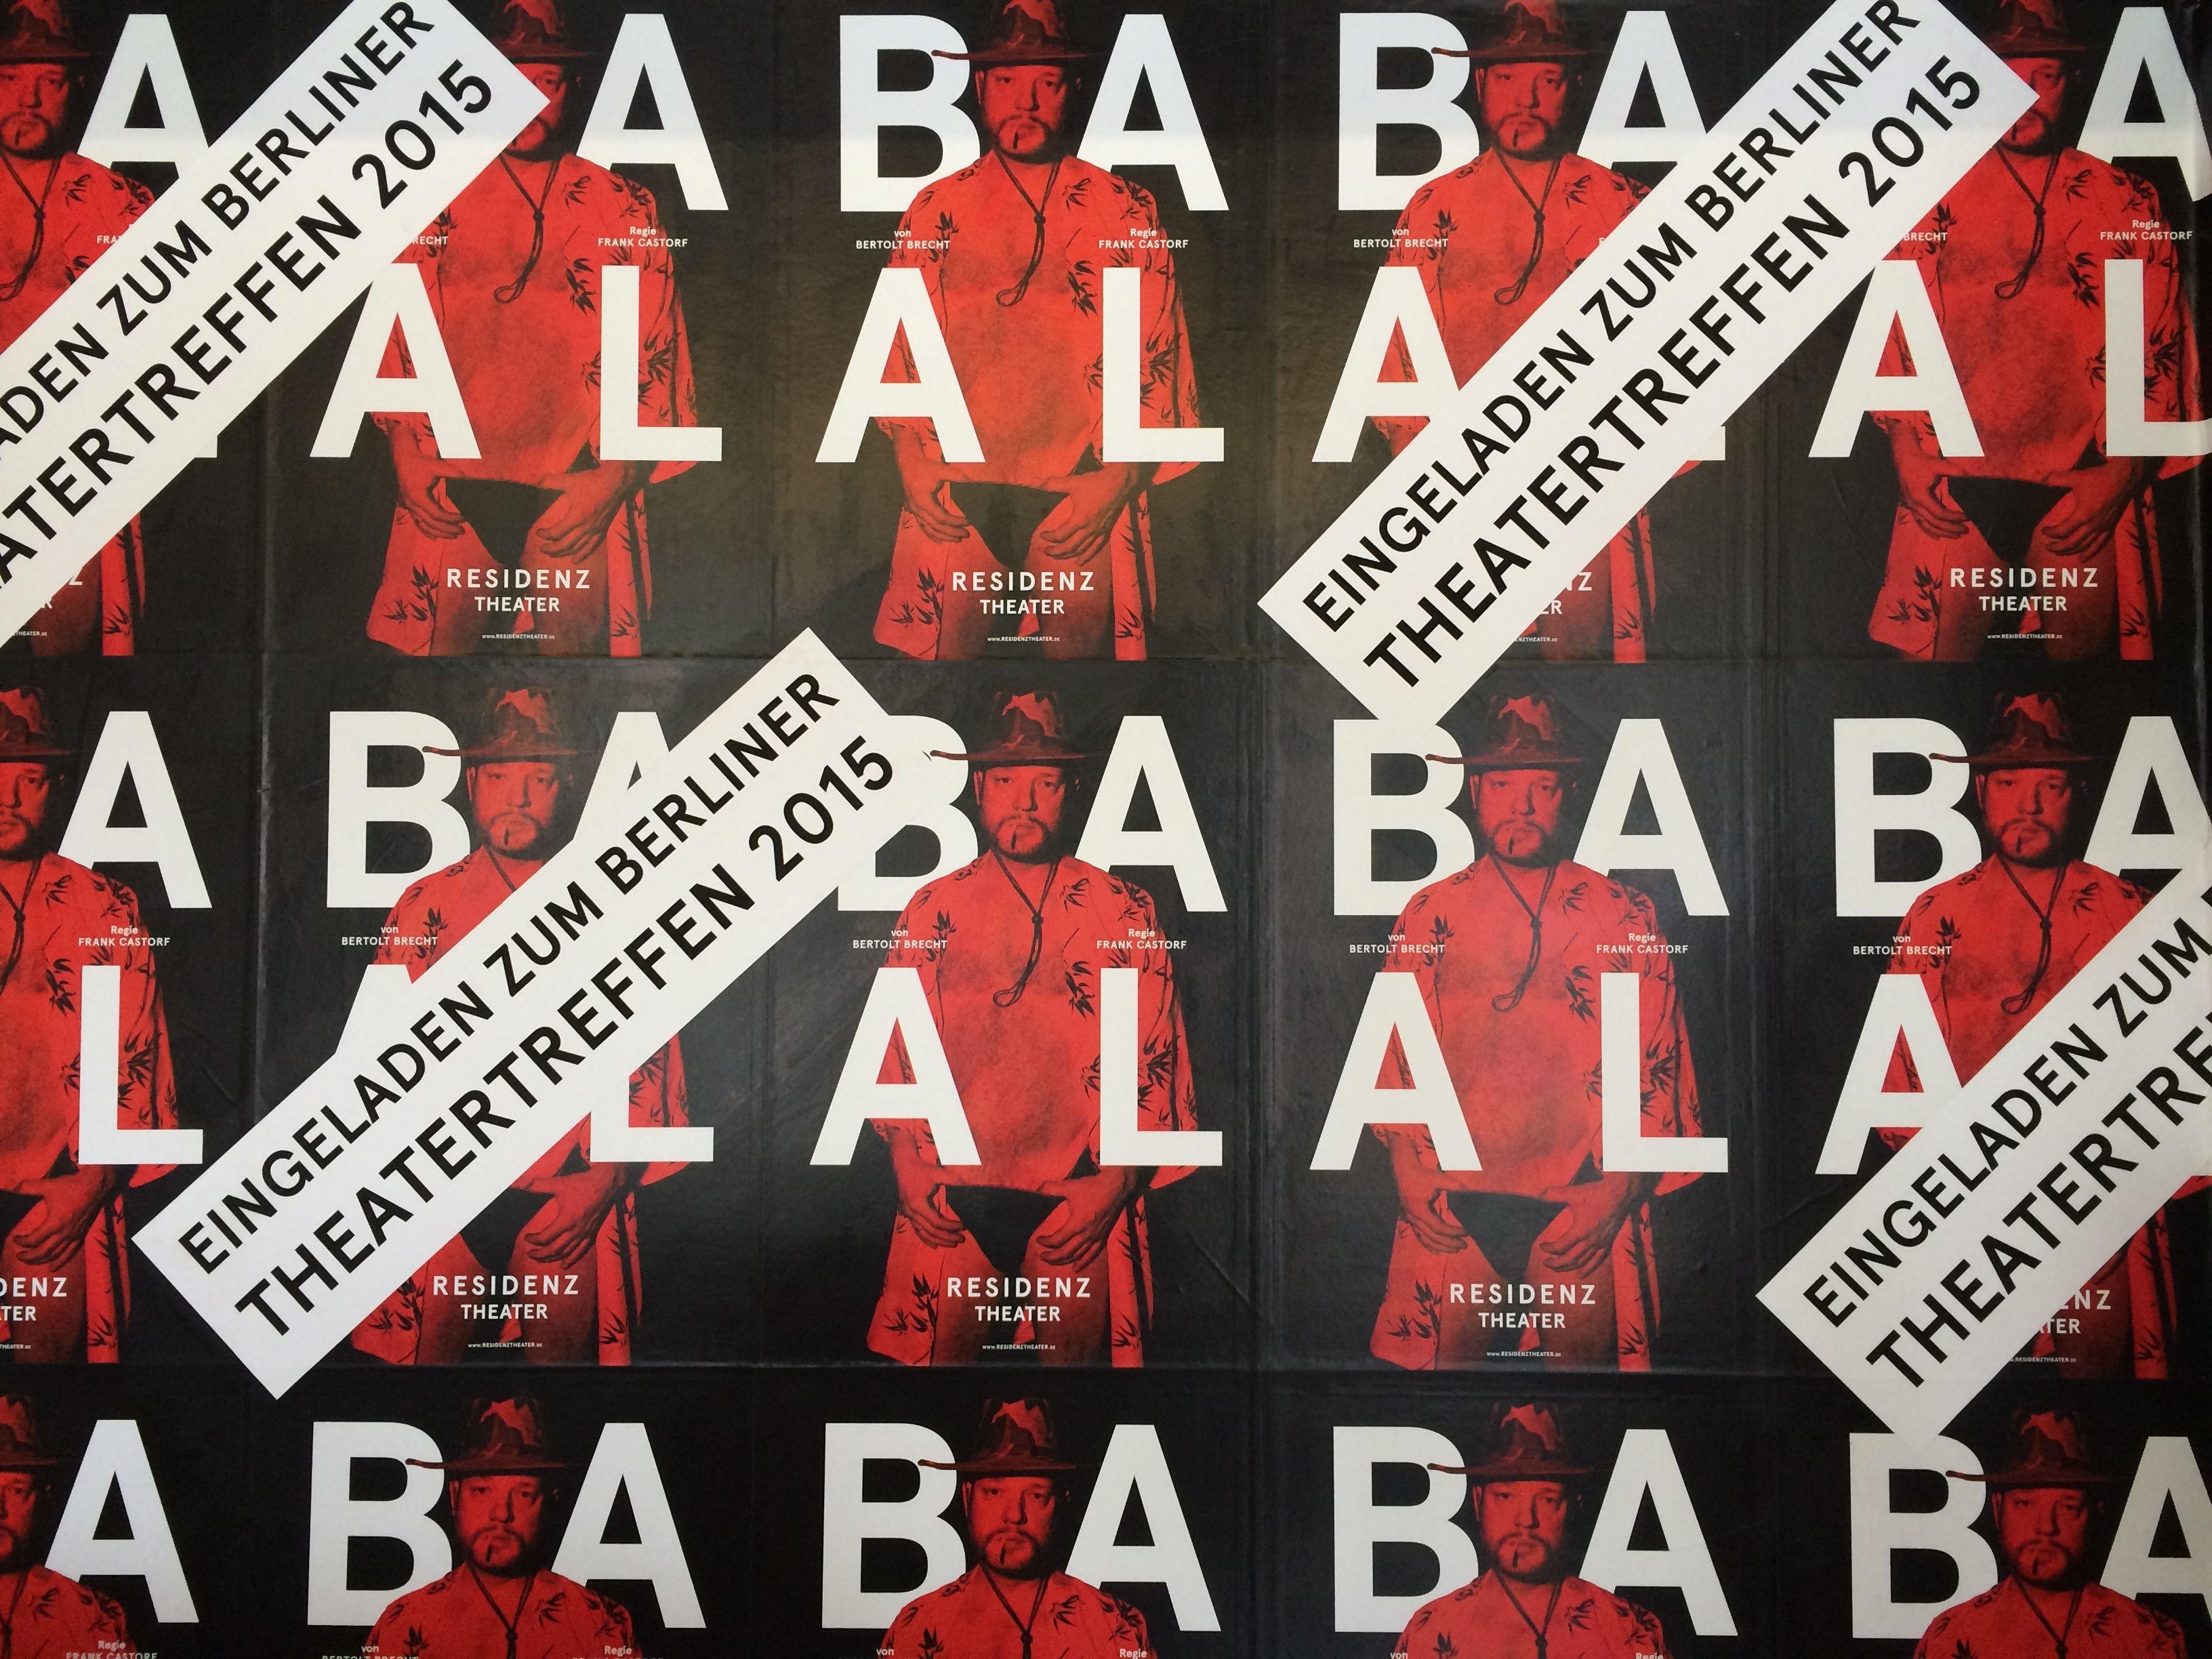 Theatertreffen 2015 Mit Baal Residenztheater Theatertreffen Baal Brecht Plakat Rot Resi Game Artwork Video Games Artwork Video Game Covers